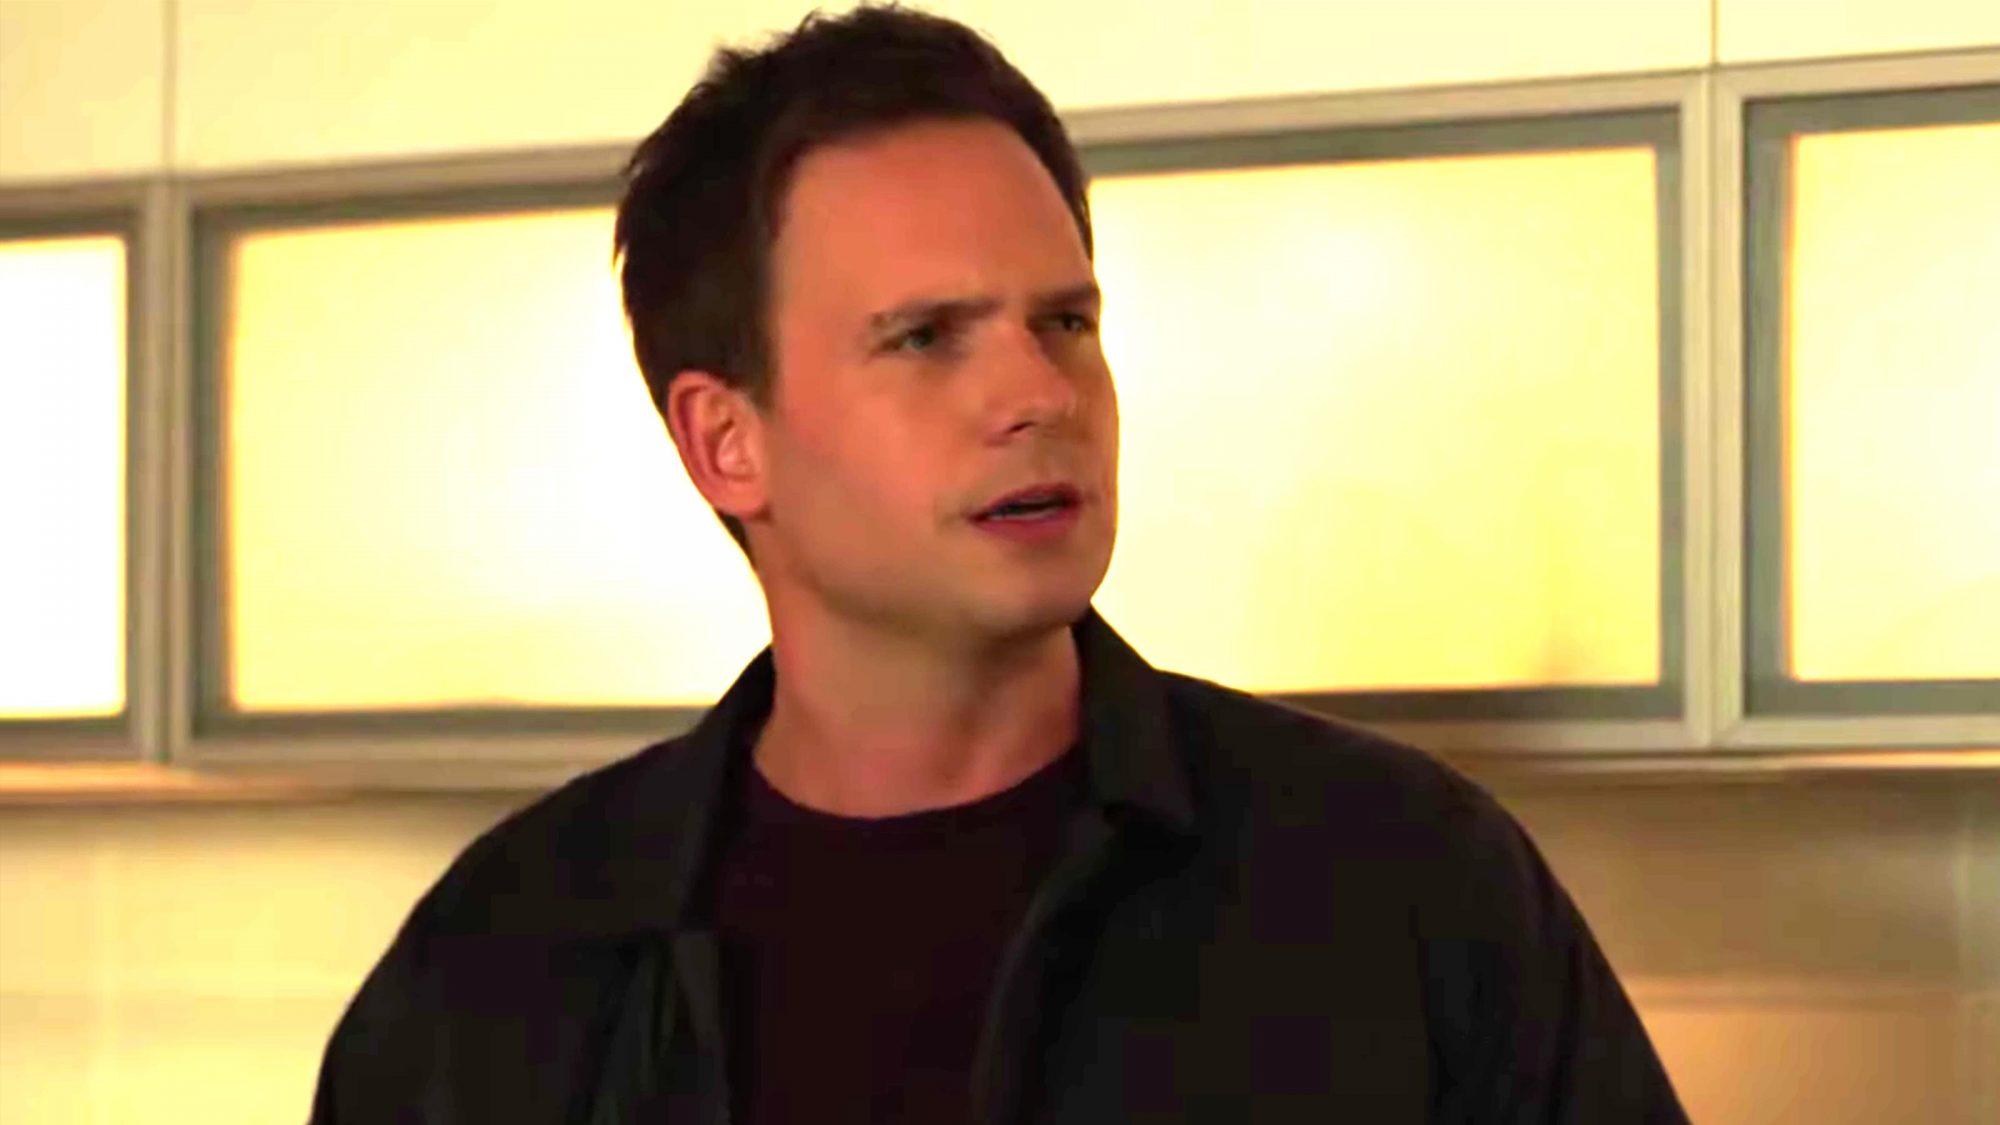 SUITS -- Episode 905 (screen grab) Patrick J. Adams CR: USA Network